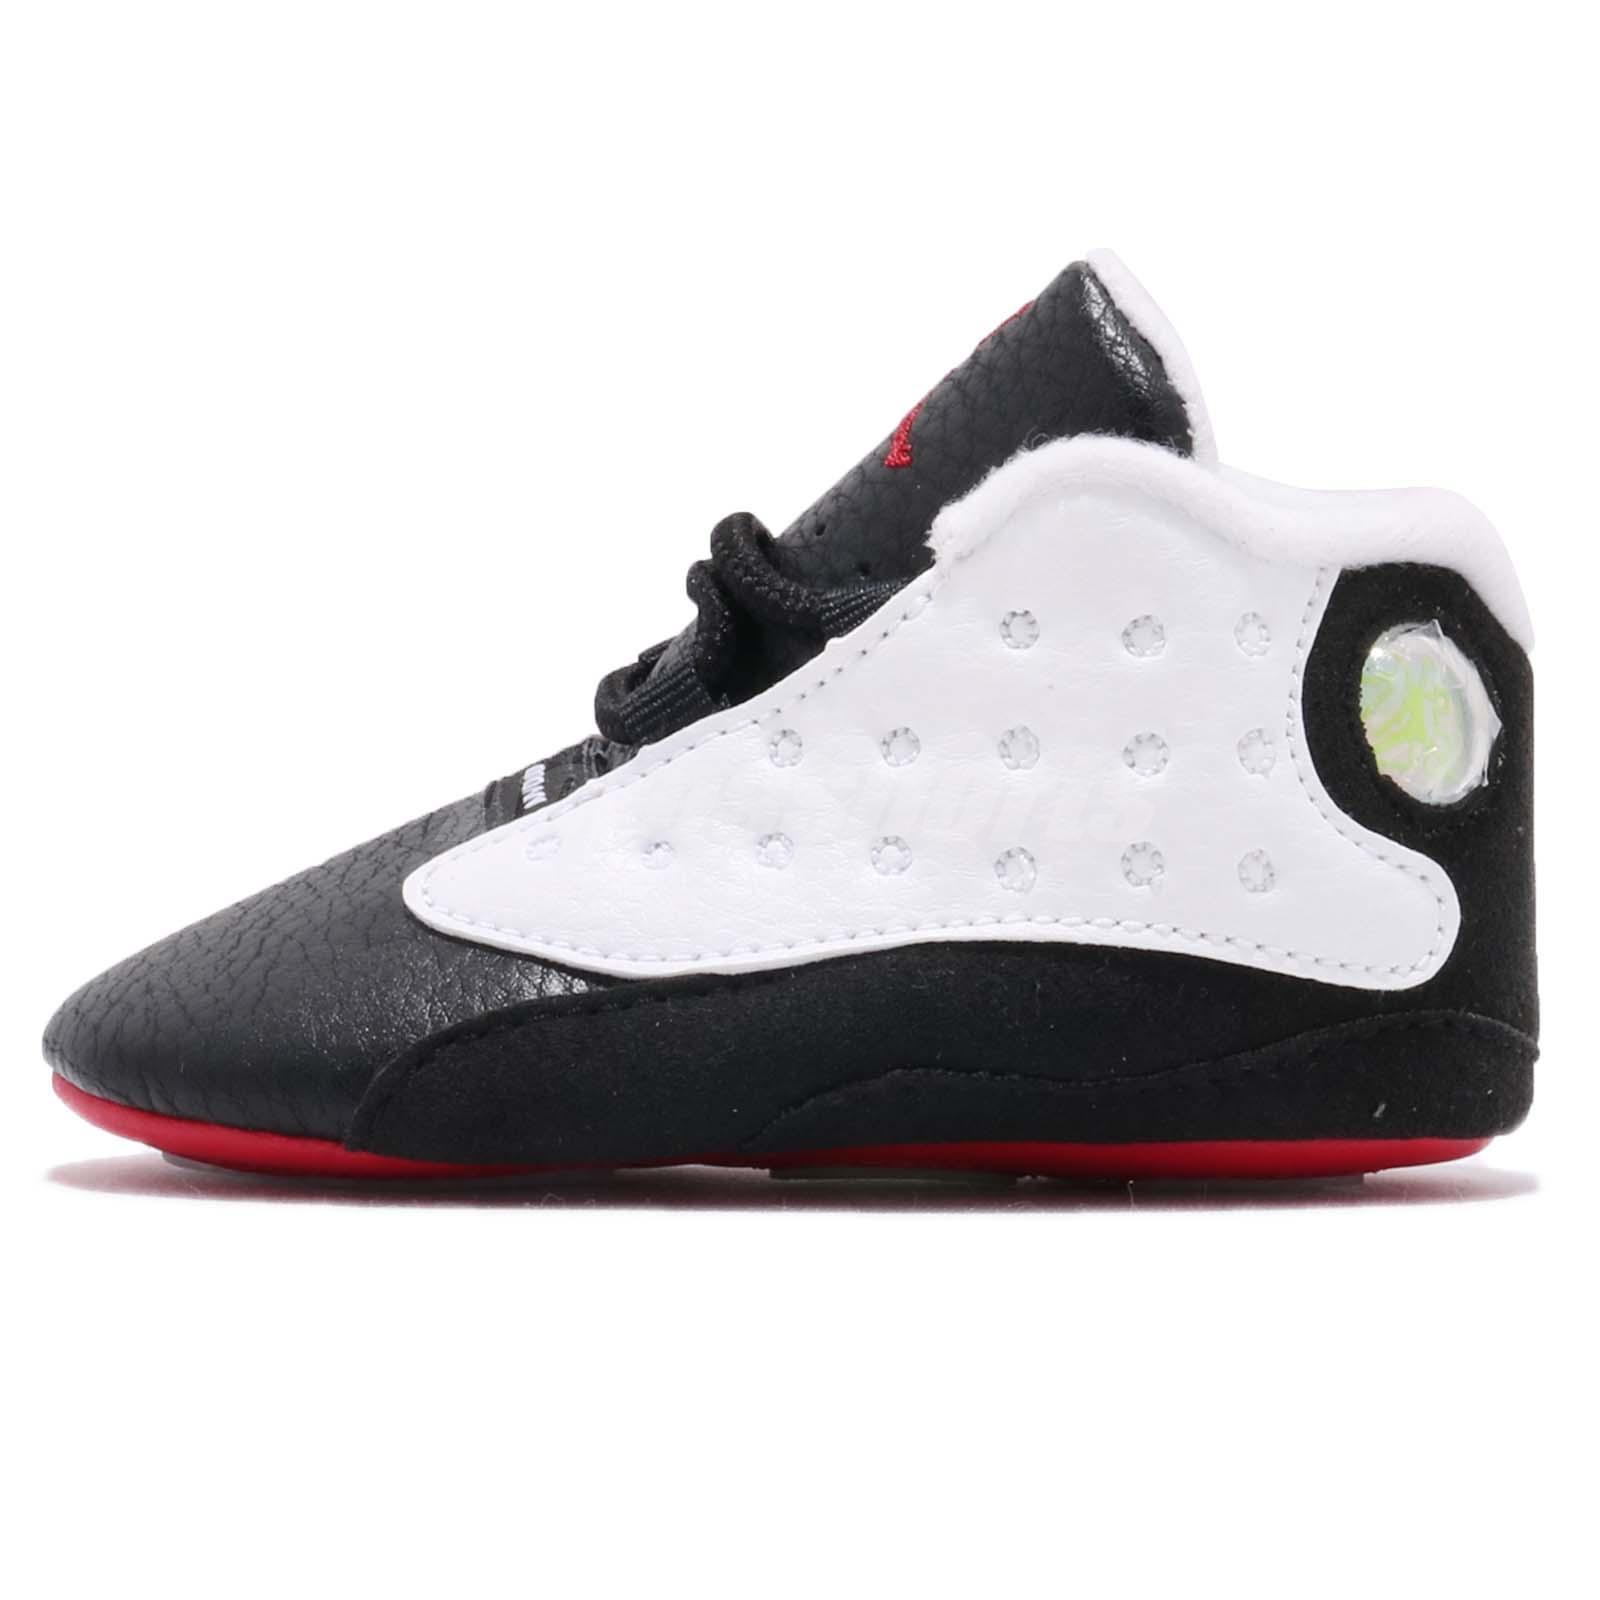 72c734496f6878 Nike Jordan 13 Retro Gift Pack XIII AJ13 He Got Game Toddler Infant  552664-104